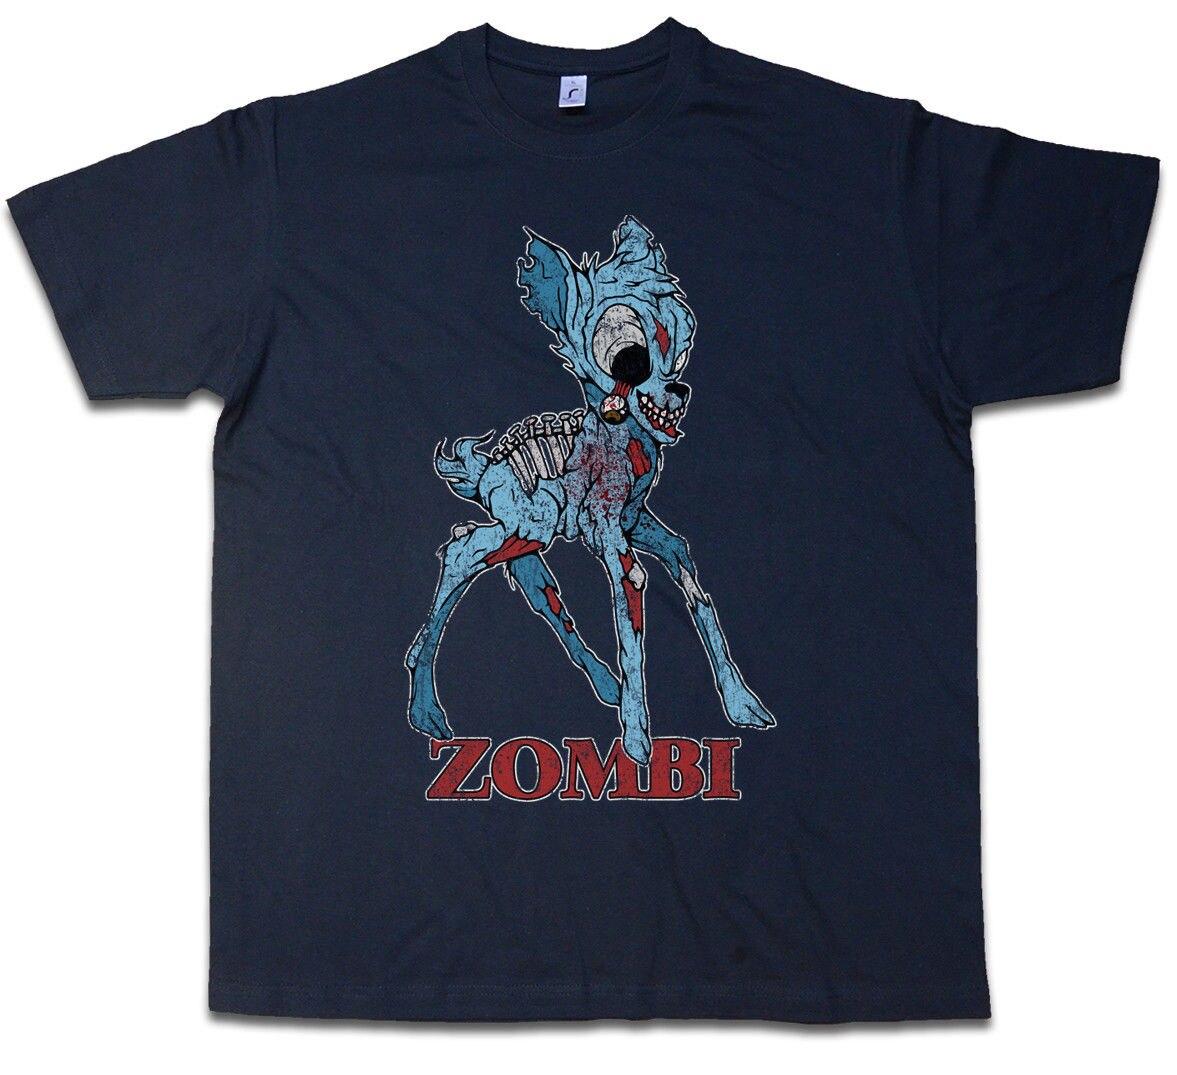 Camiseta zobi II ciervo divertido Drácula vampiro murciélago ZOMBI Halloween salpicadura Bambi camiseta Tops verano Cool divertida camiseta